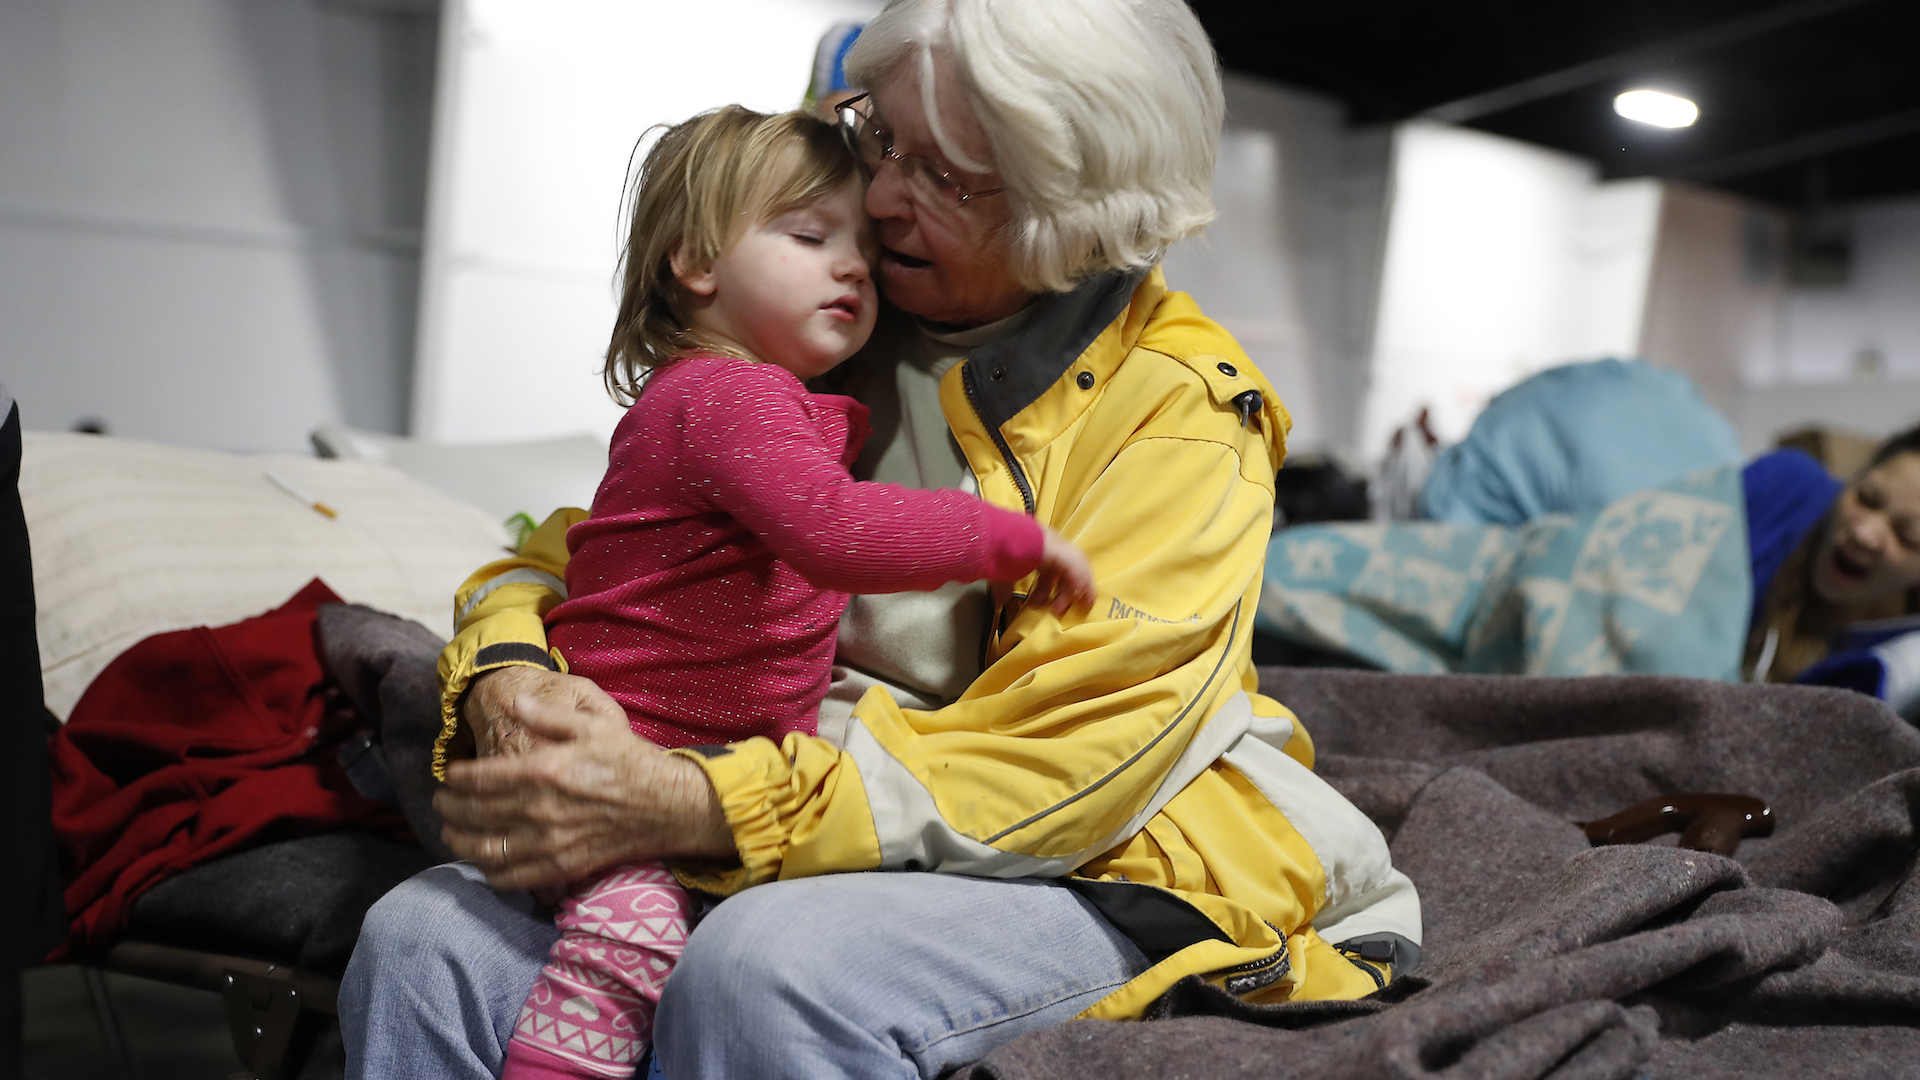 188,000 evacuated as California's massive Oroville Dam threatens catastrophic floods